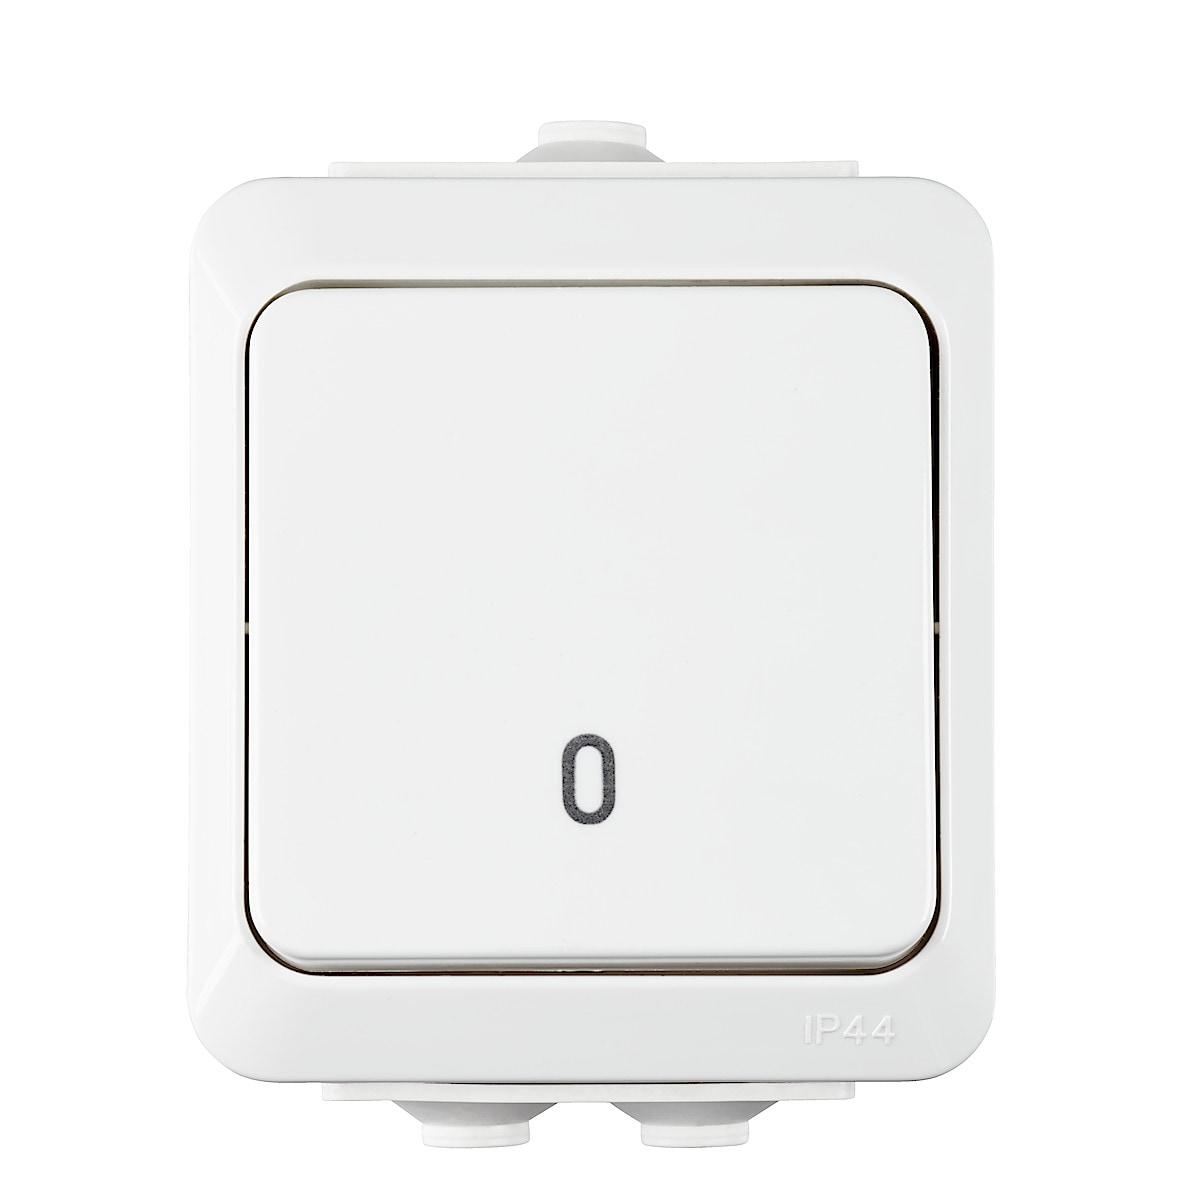 Utanpåliggande strömbrytare IP44 Cotech